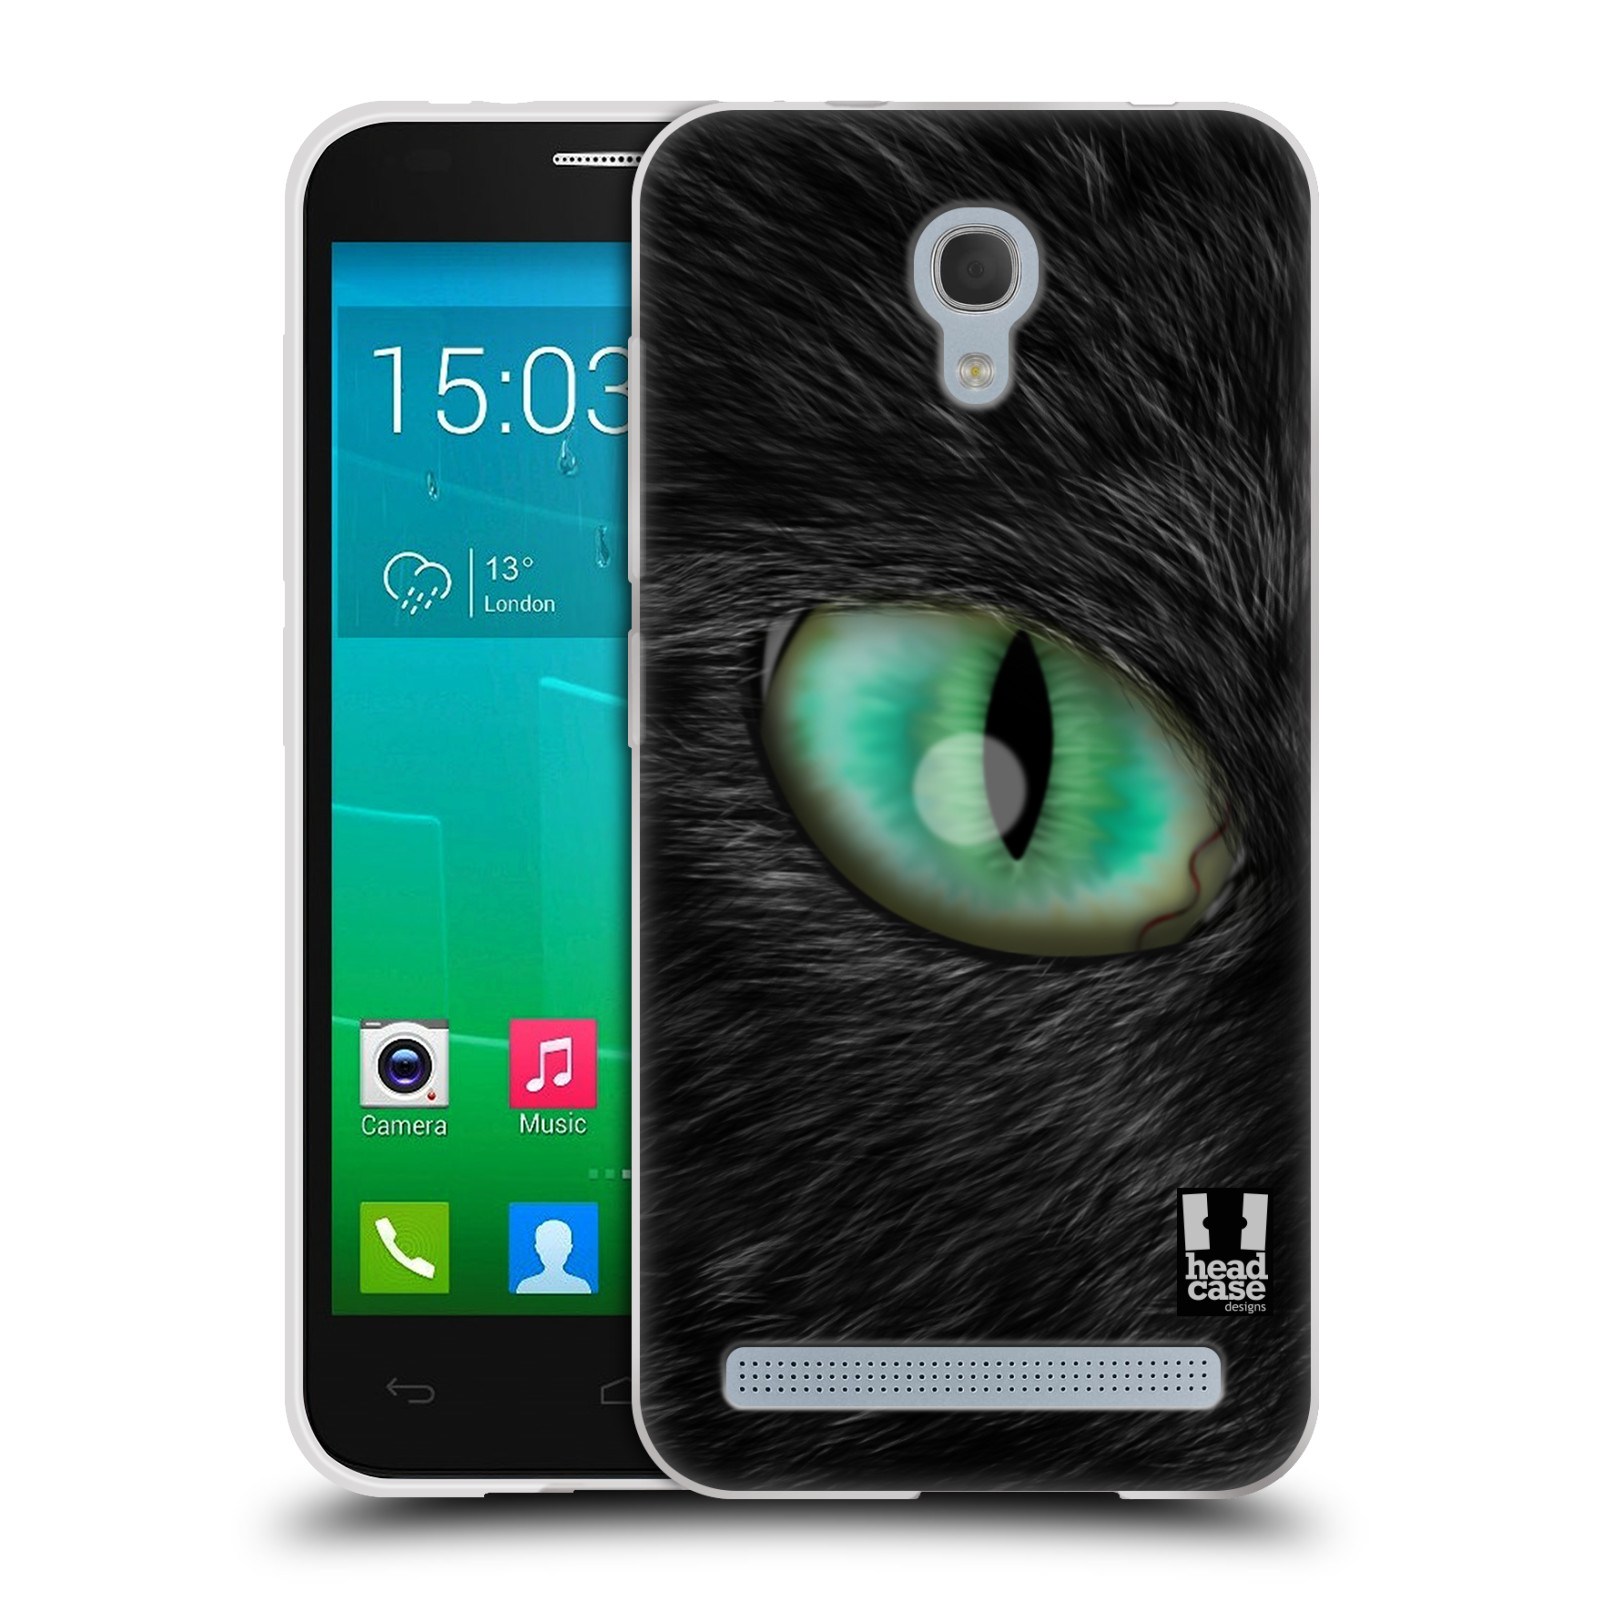 HEAD CASE silikonový obal na mobil Alcatel Idol 2 MINI S 6036Y vzor pohled zvířete oko kočka